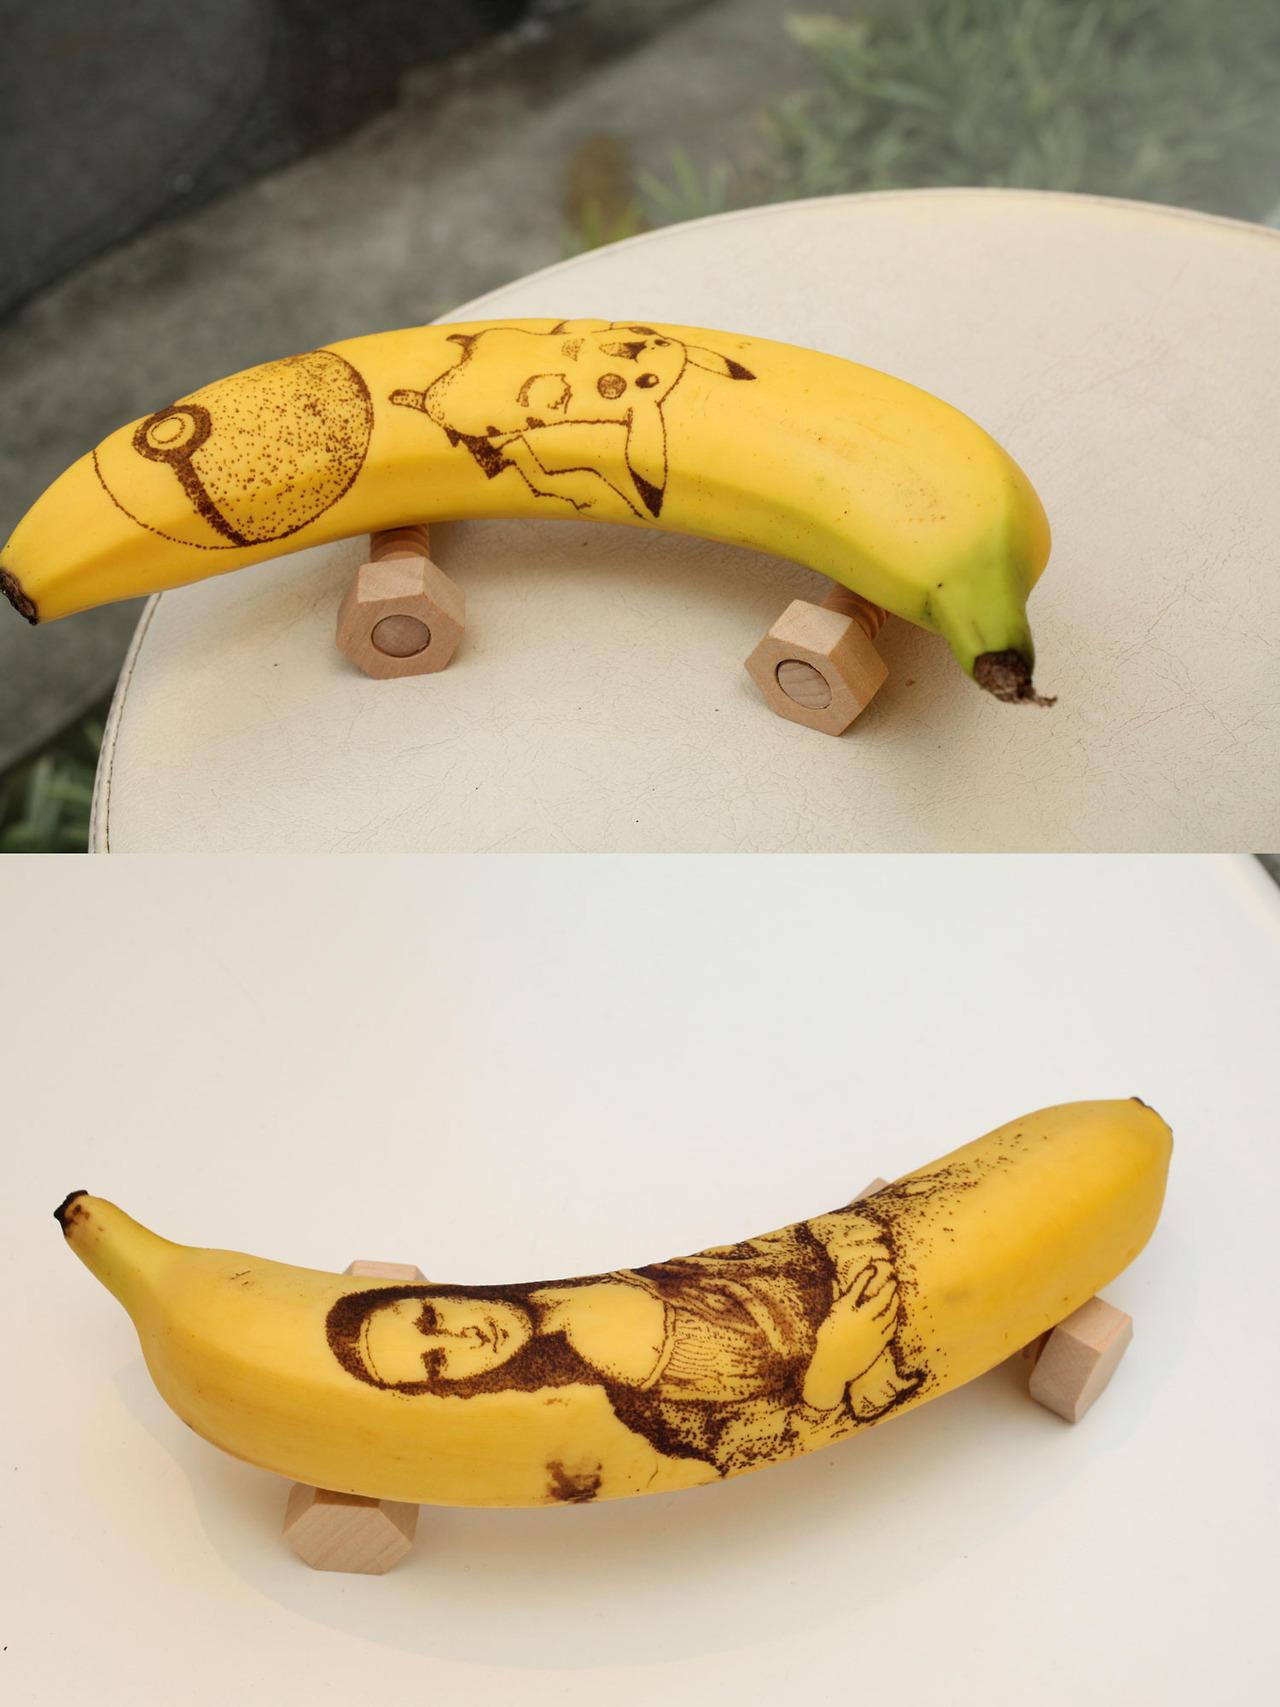 картинки забавного банана ценит свою